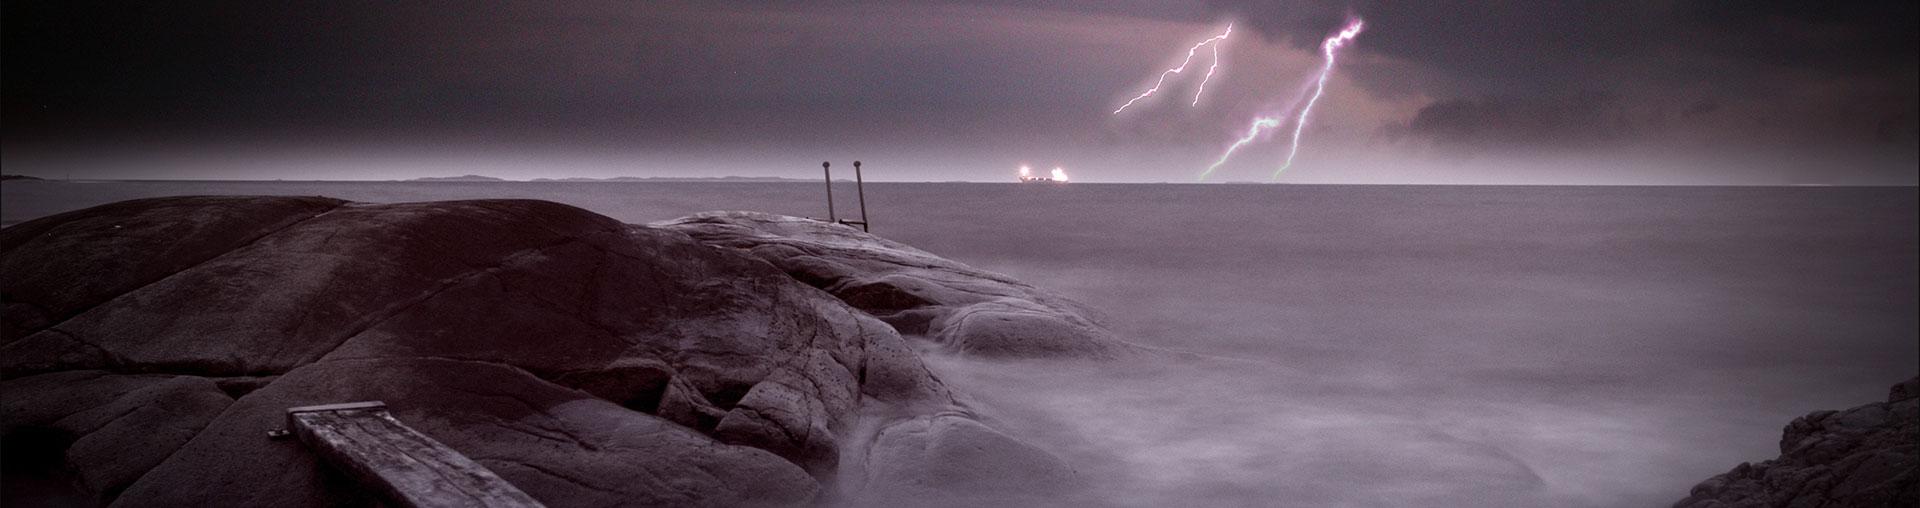 Bentzen Elektro bilde av lyn